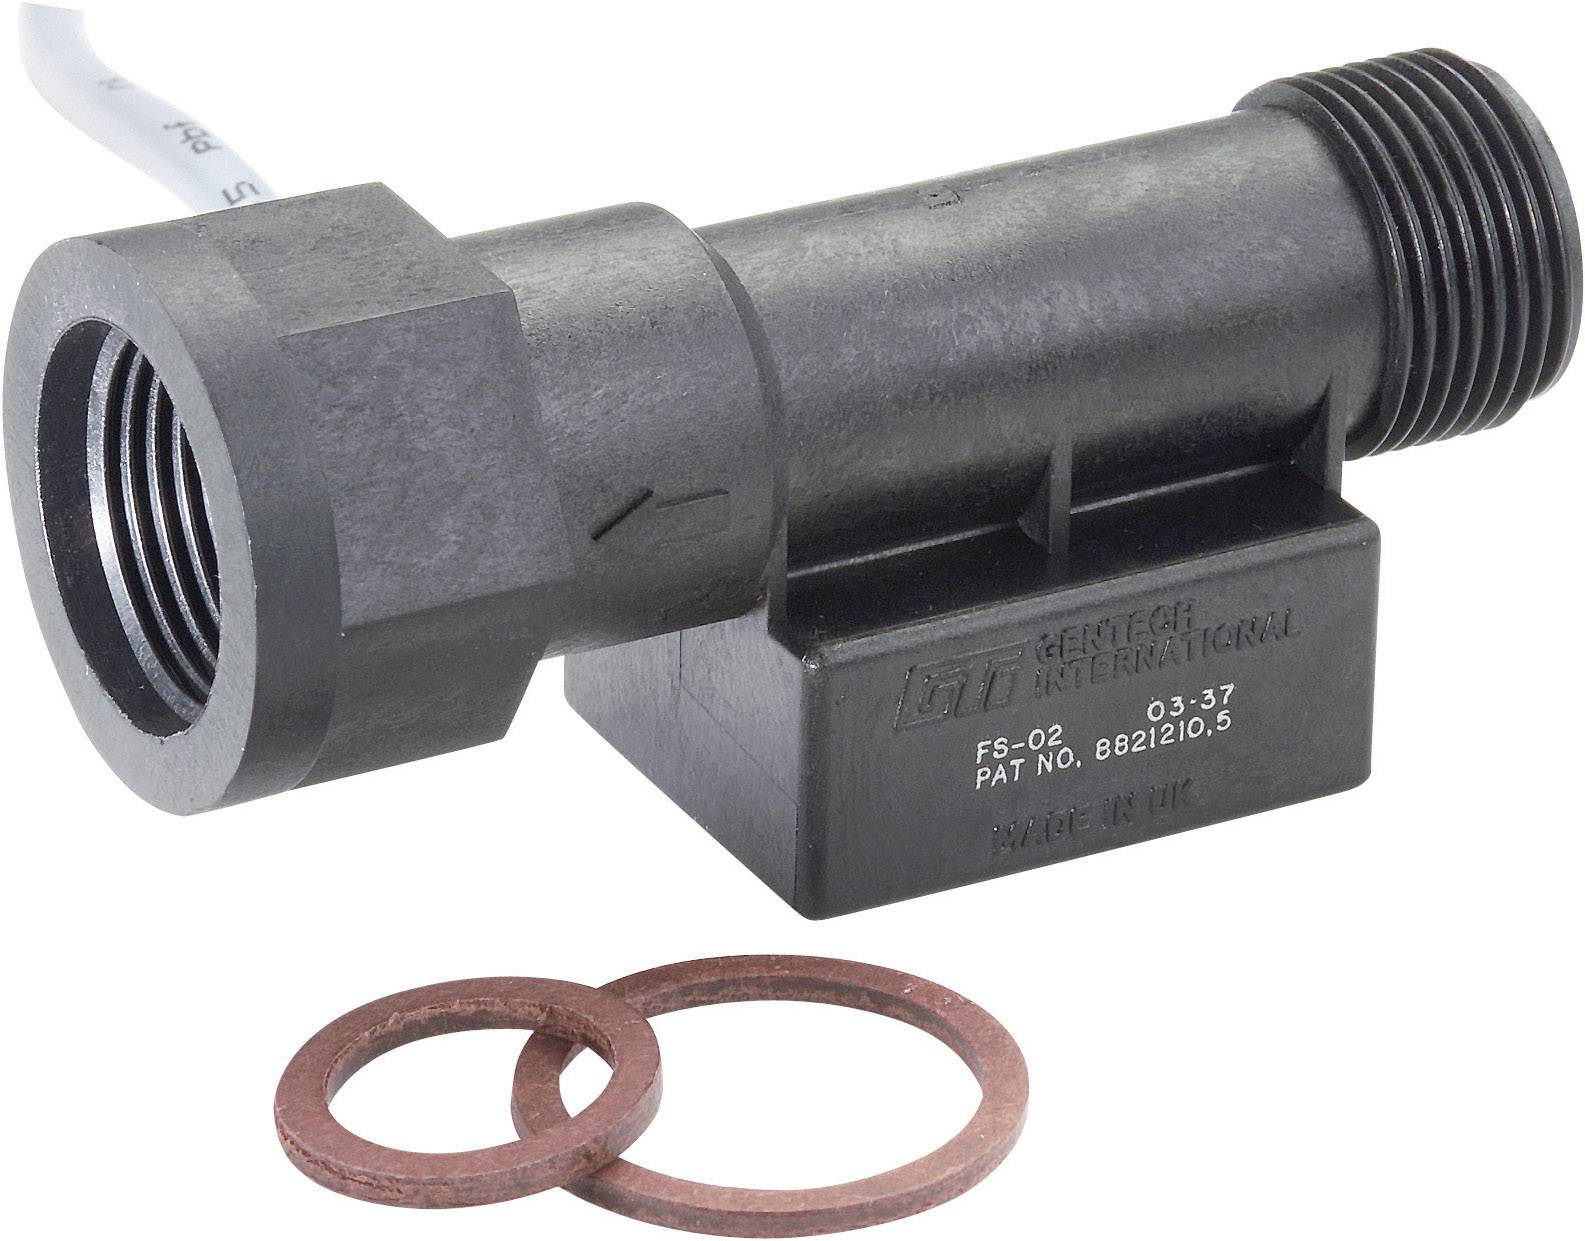 Senzor průtoku TE Connectivity Sensor FS-01, (d x š x v) 101.5 x 37 x 40 mm